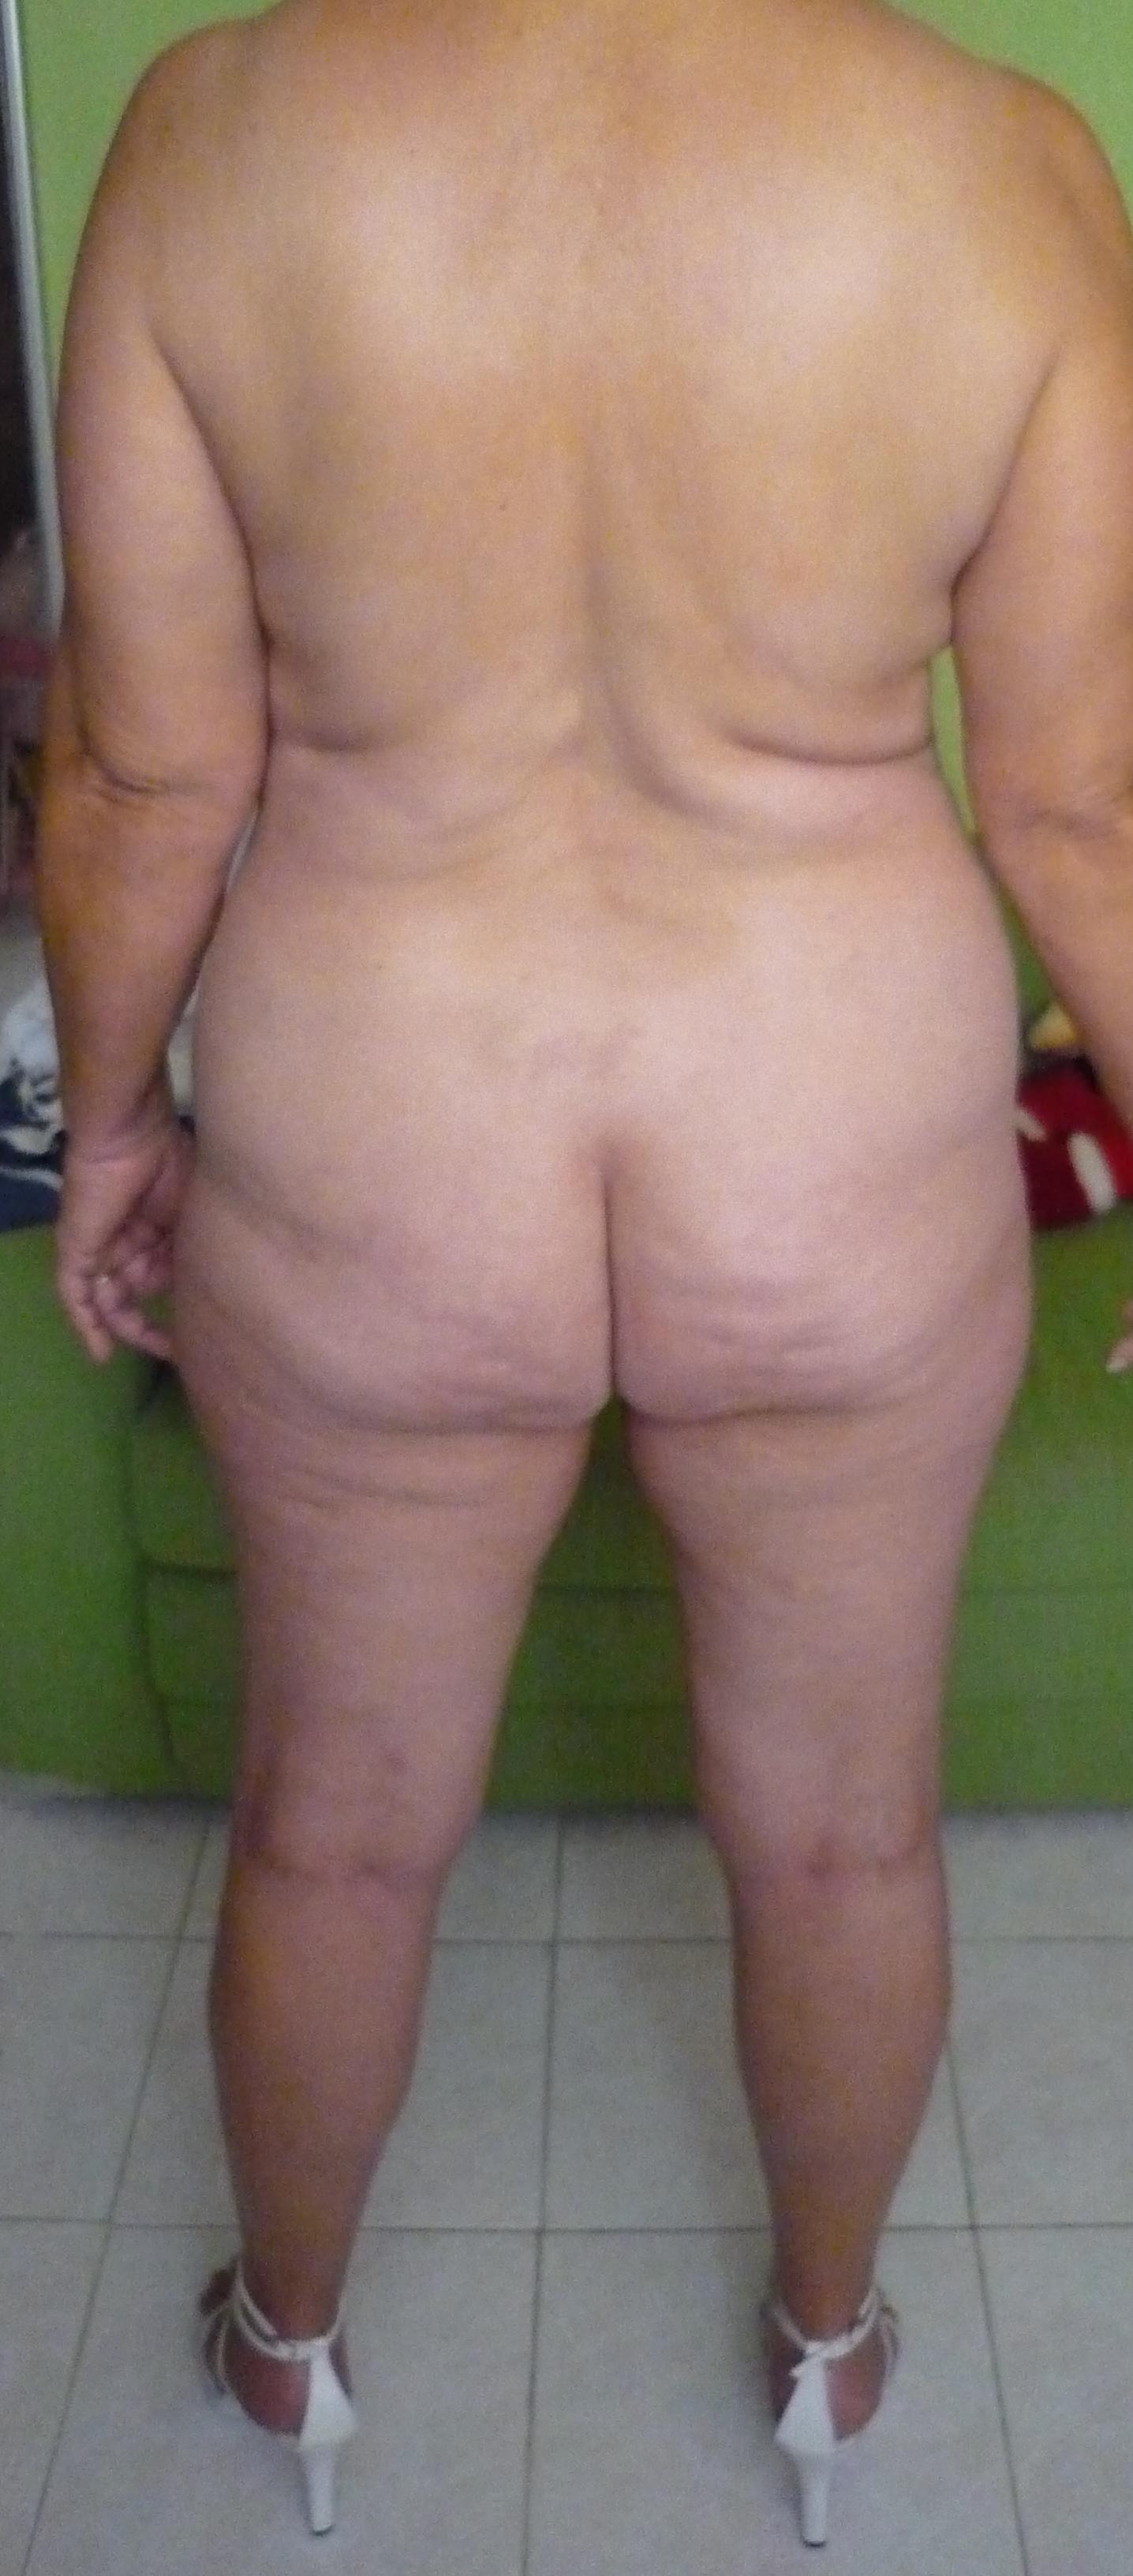 Abuelas En Pelotas abuela de 66 en bolas - poringa!